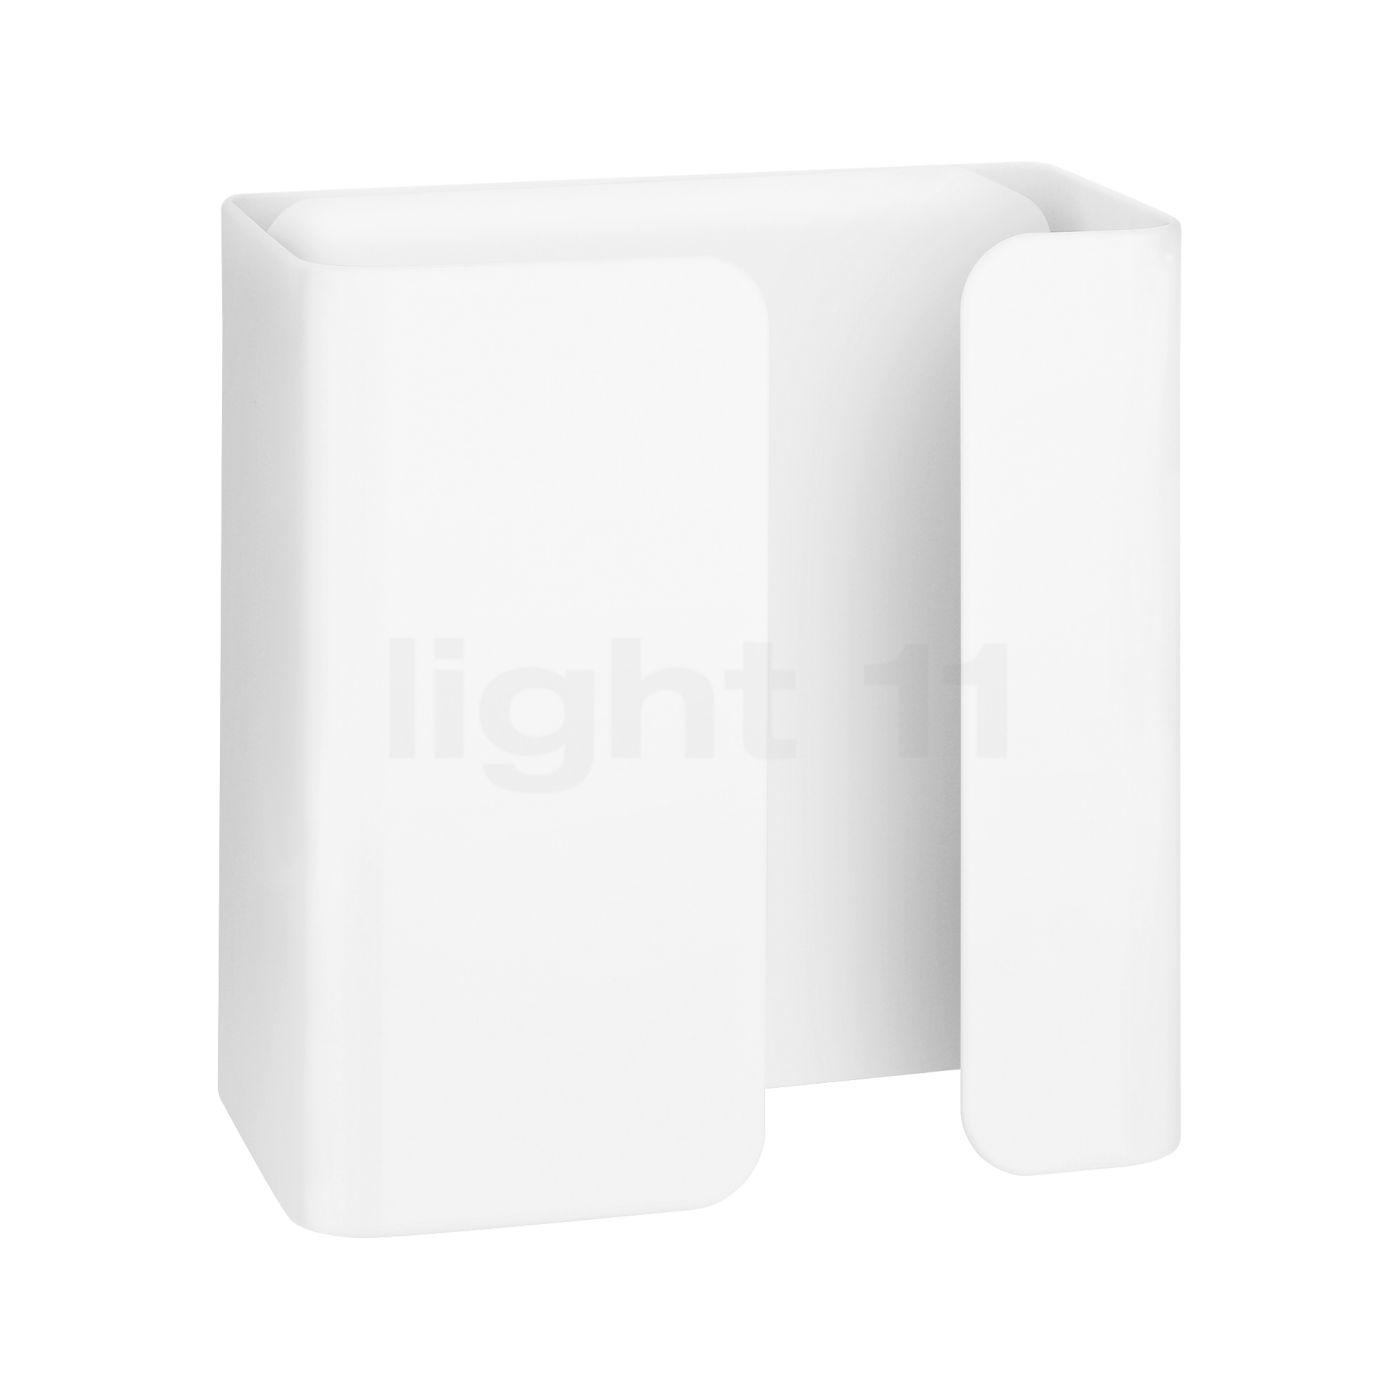 Buy philips novum wall light led at light11 aloadofball Gallery